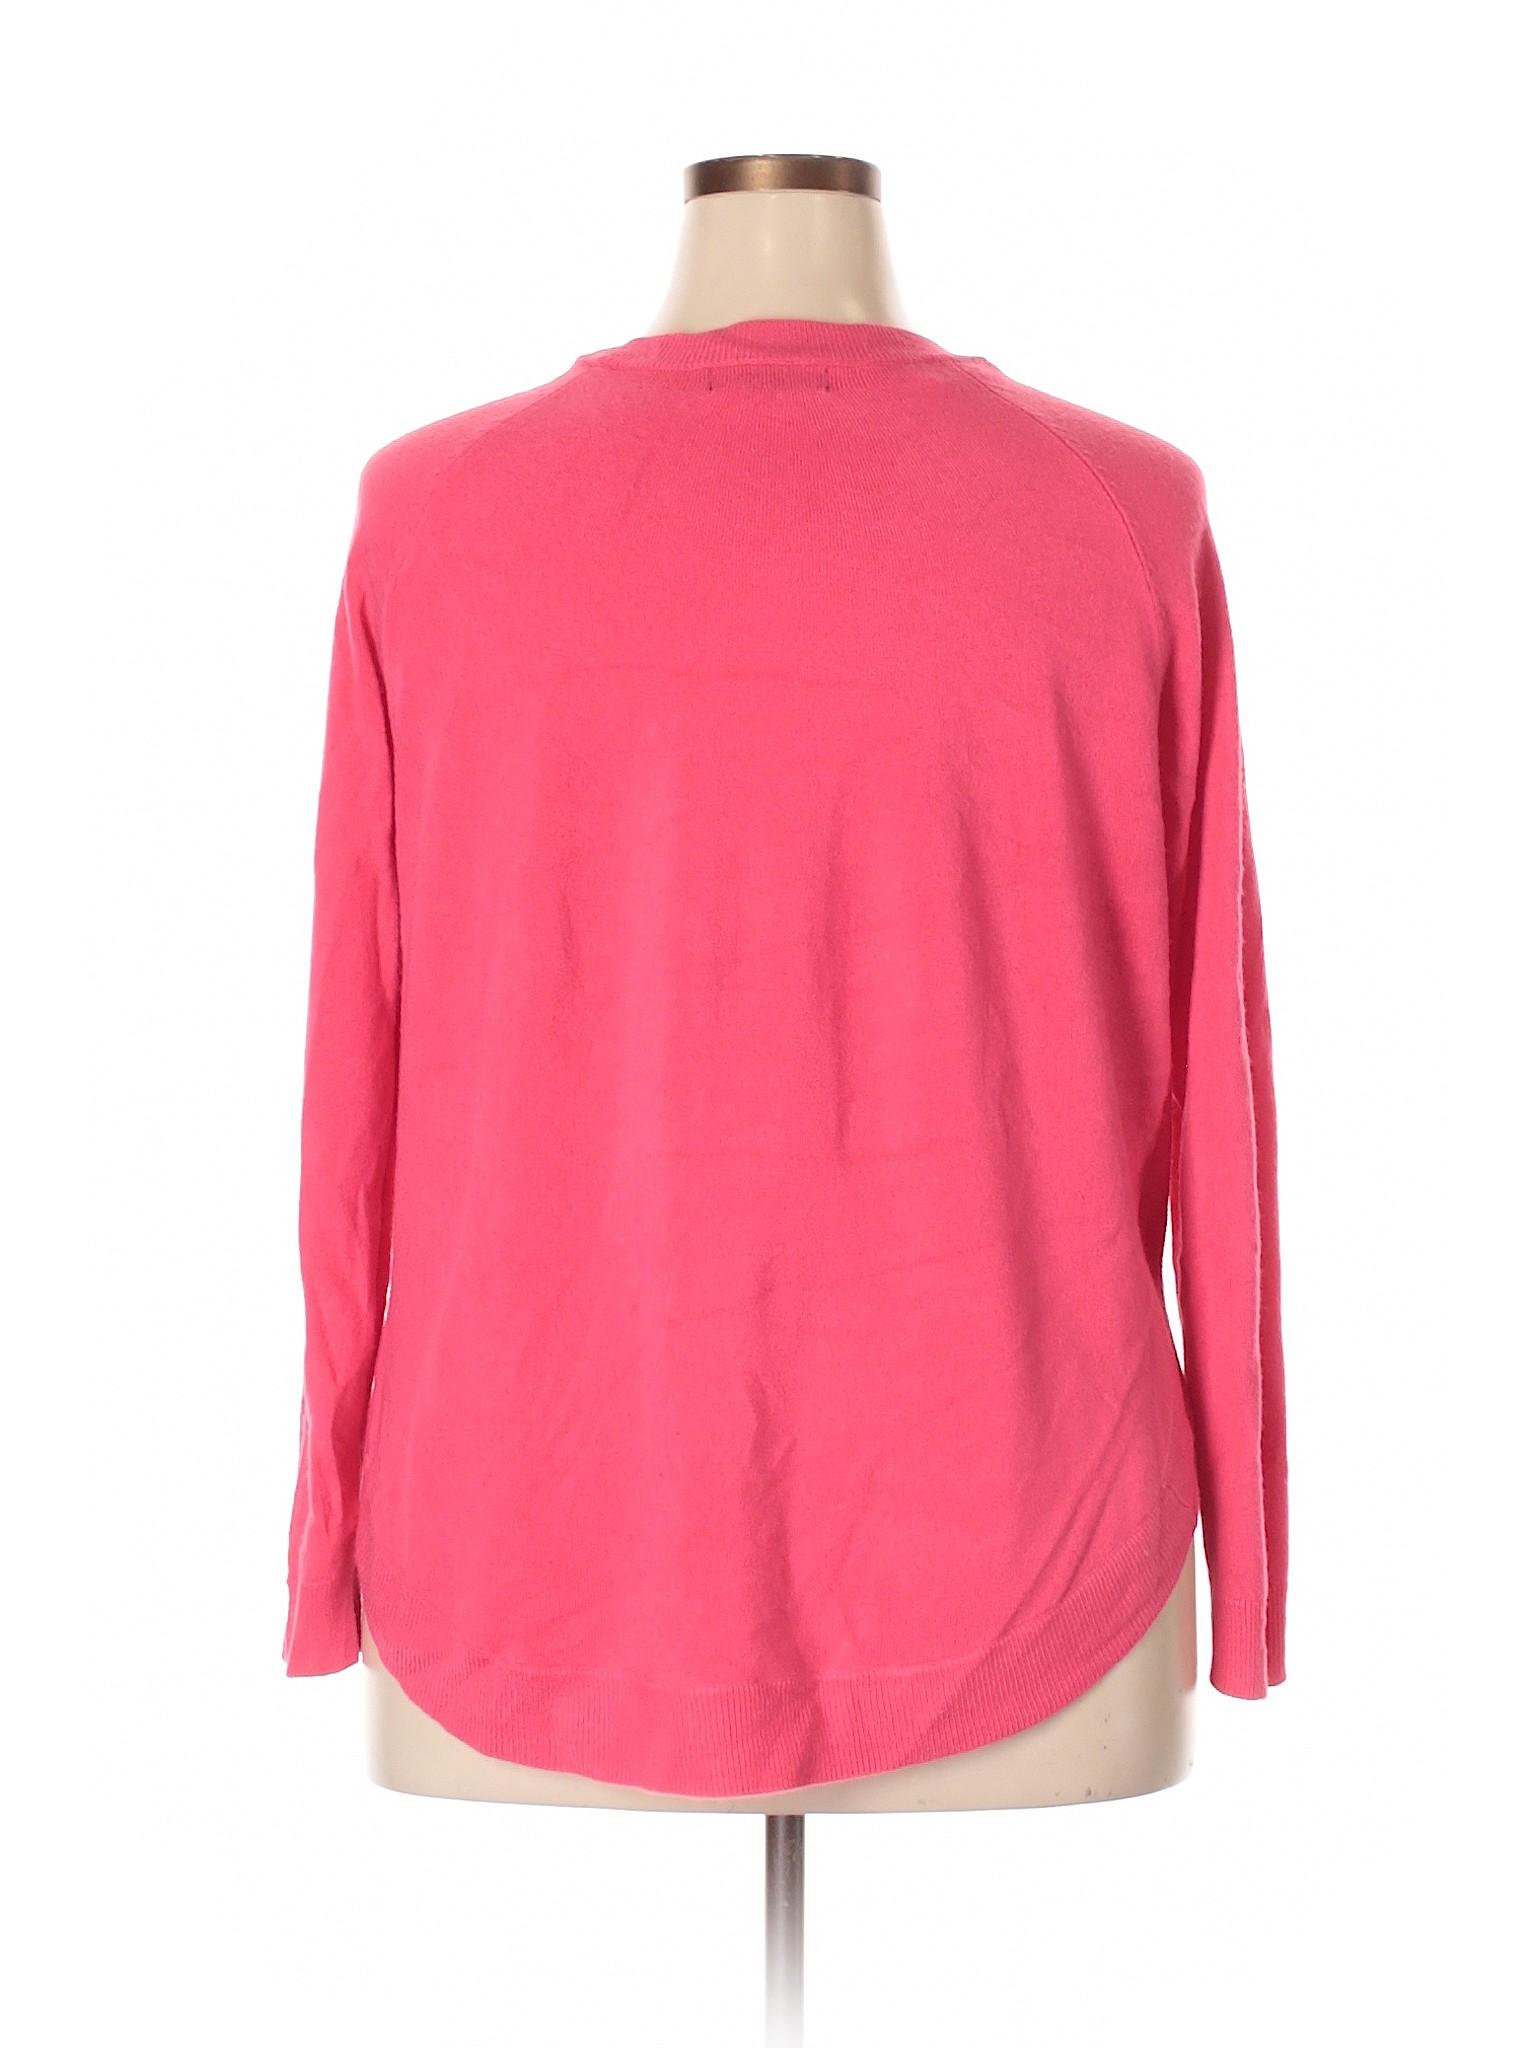 Boutique Sweater Boutique winter Boutique Pullover Atmosphere winter winter Atmosphere Pullover Sweater 1pw1qrB